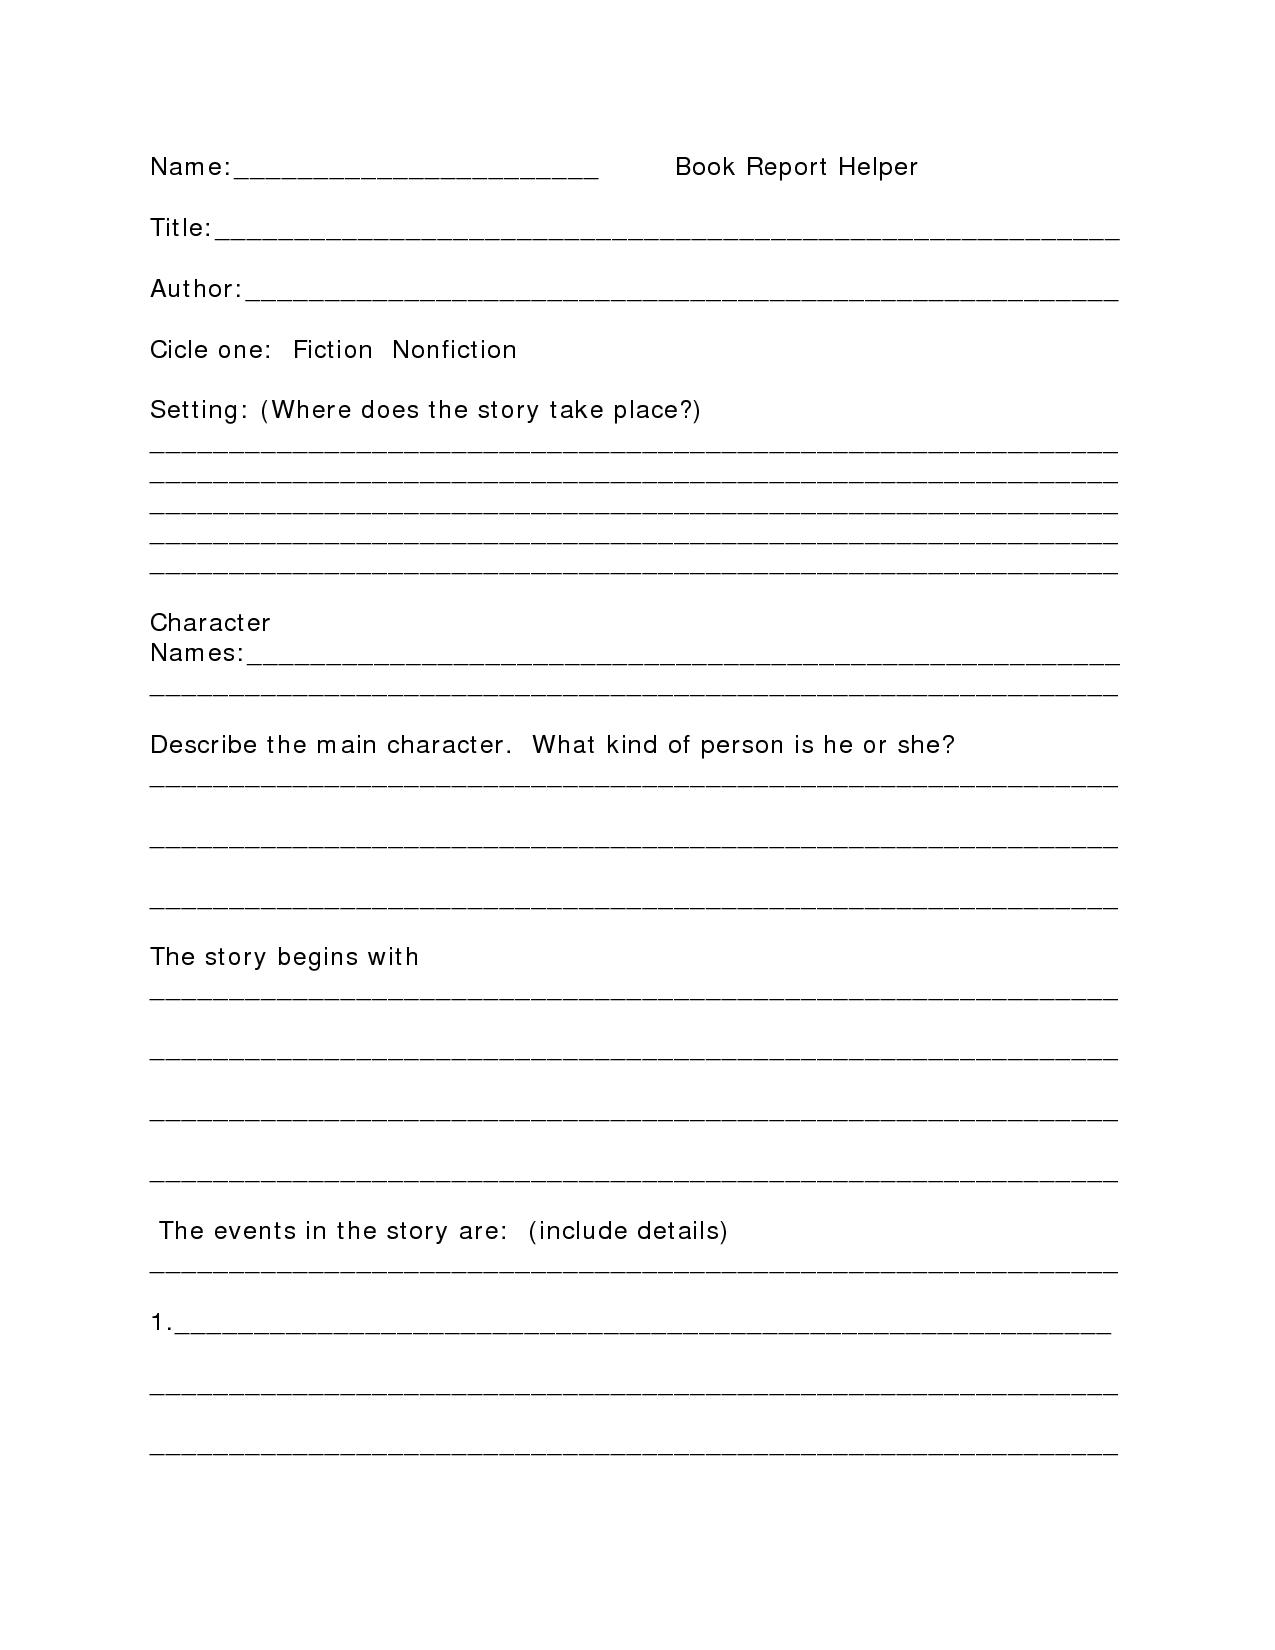 High School Book Report Outline